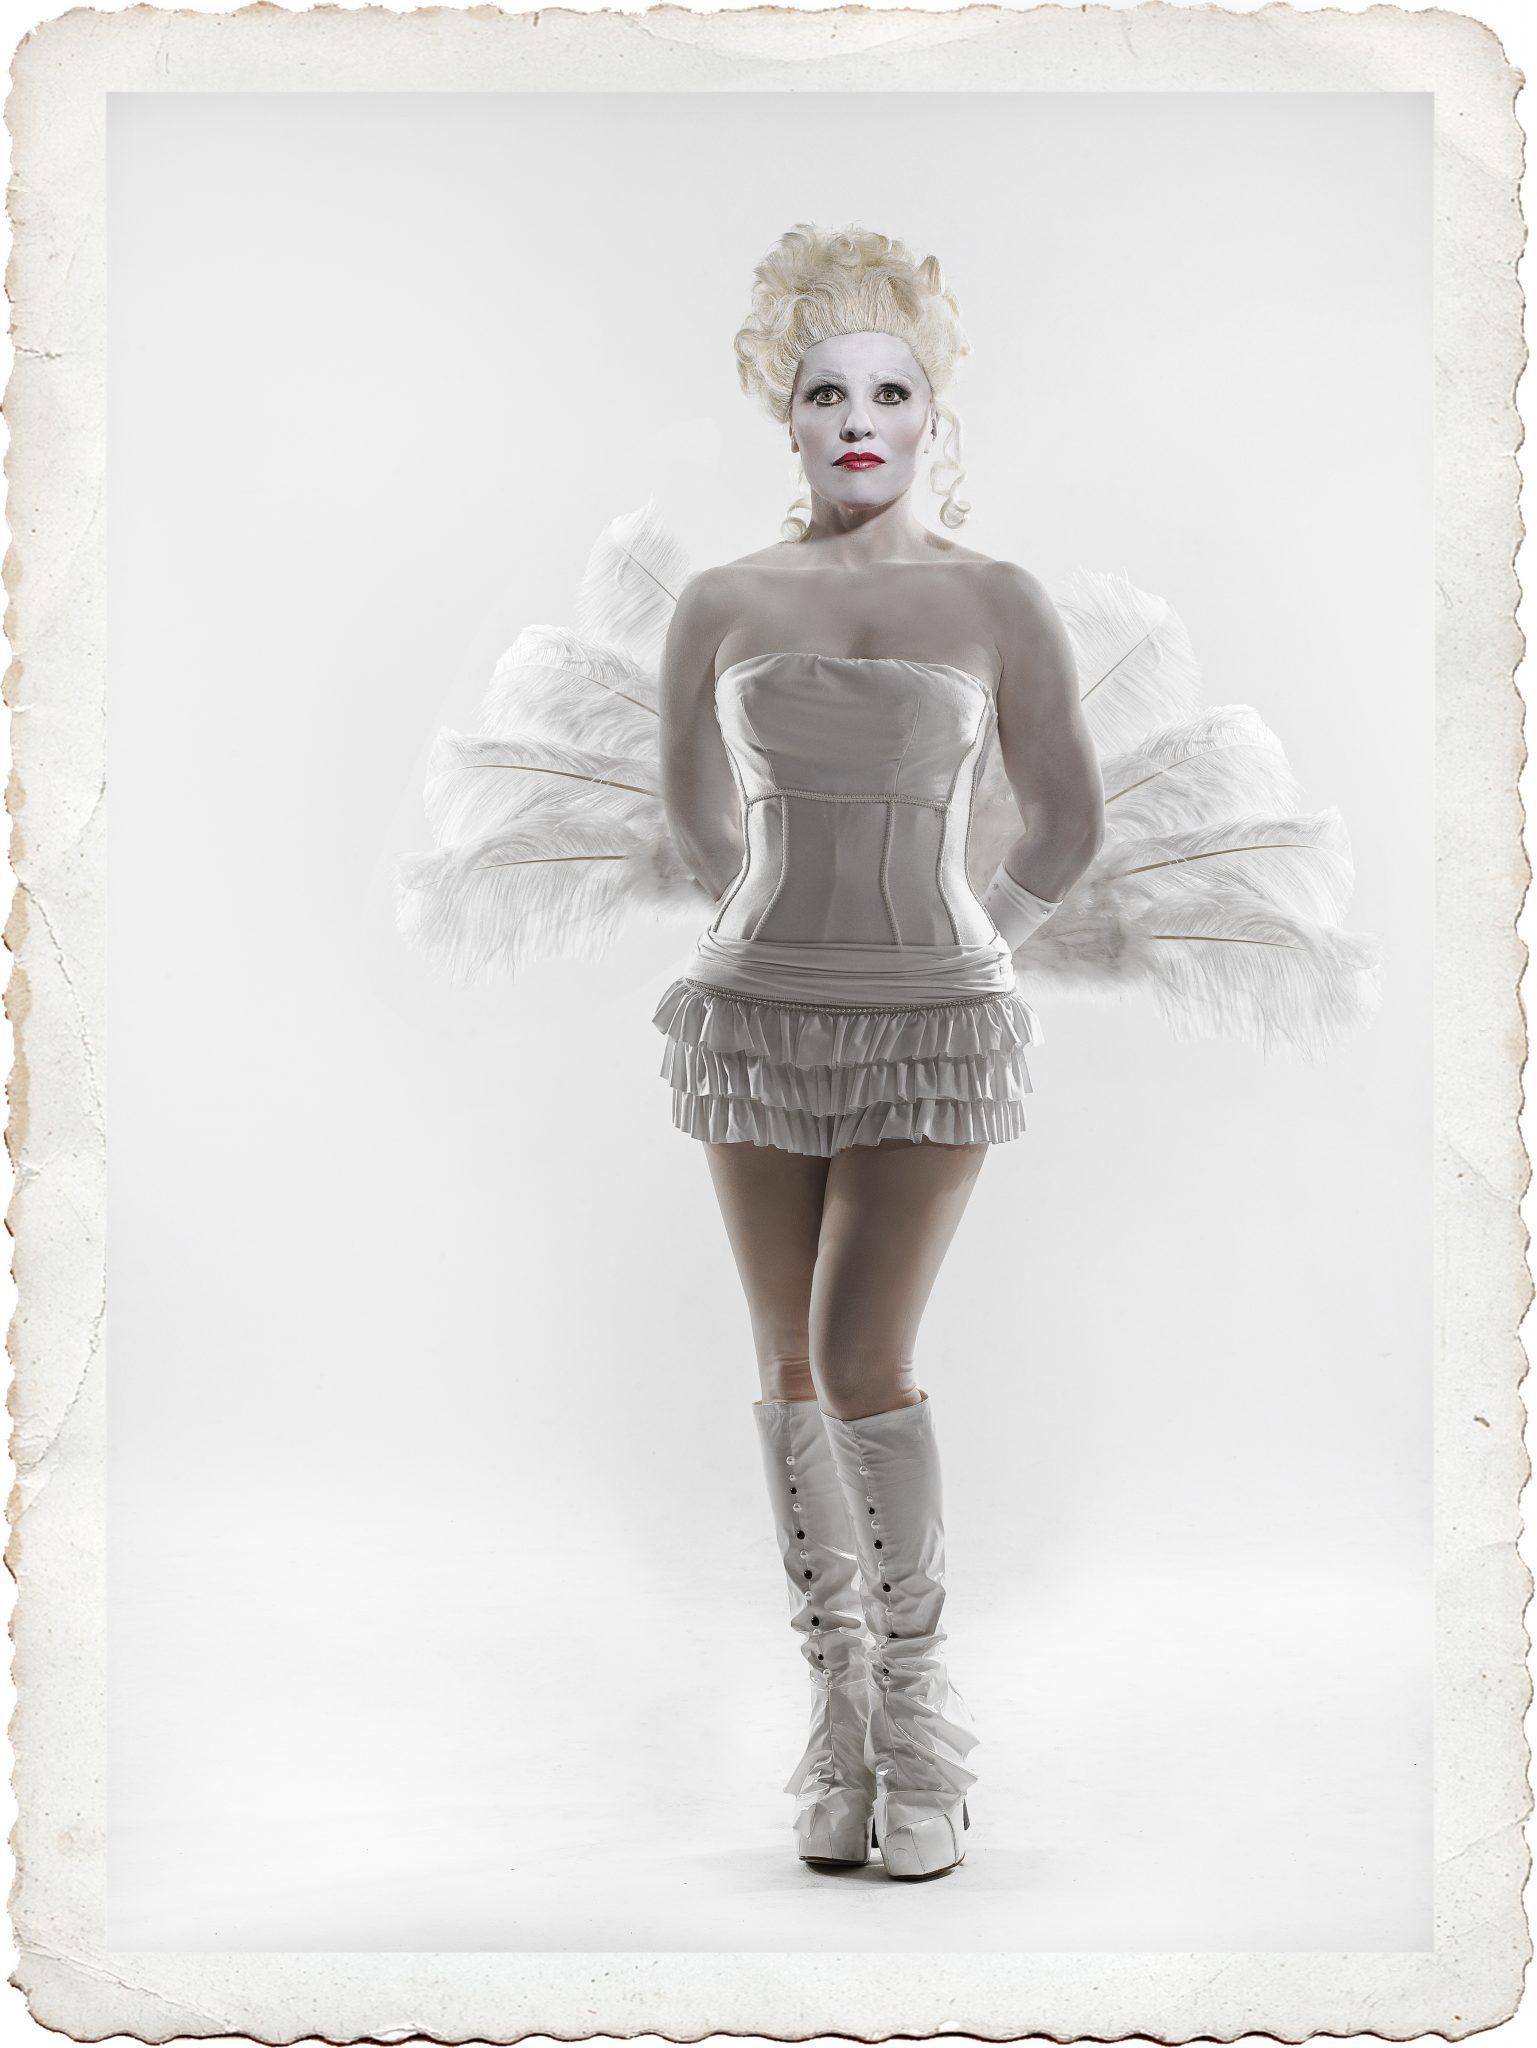 Tara Blue in Costume 463 blog